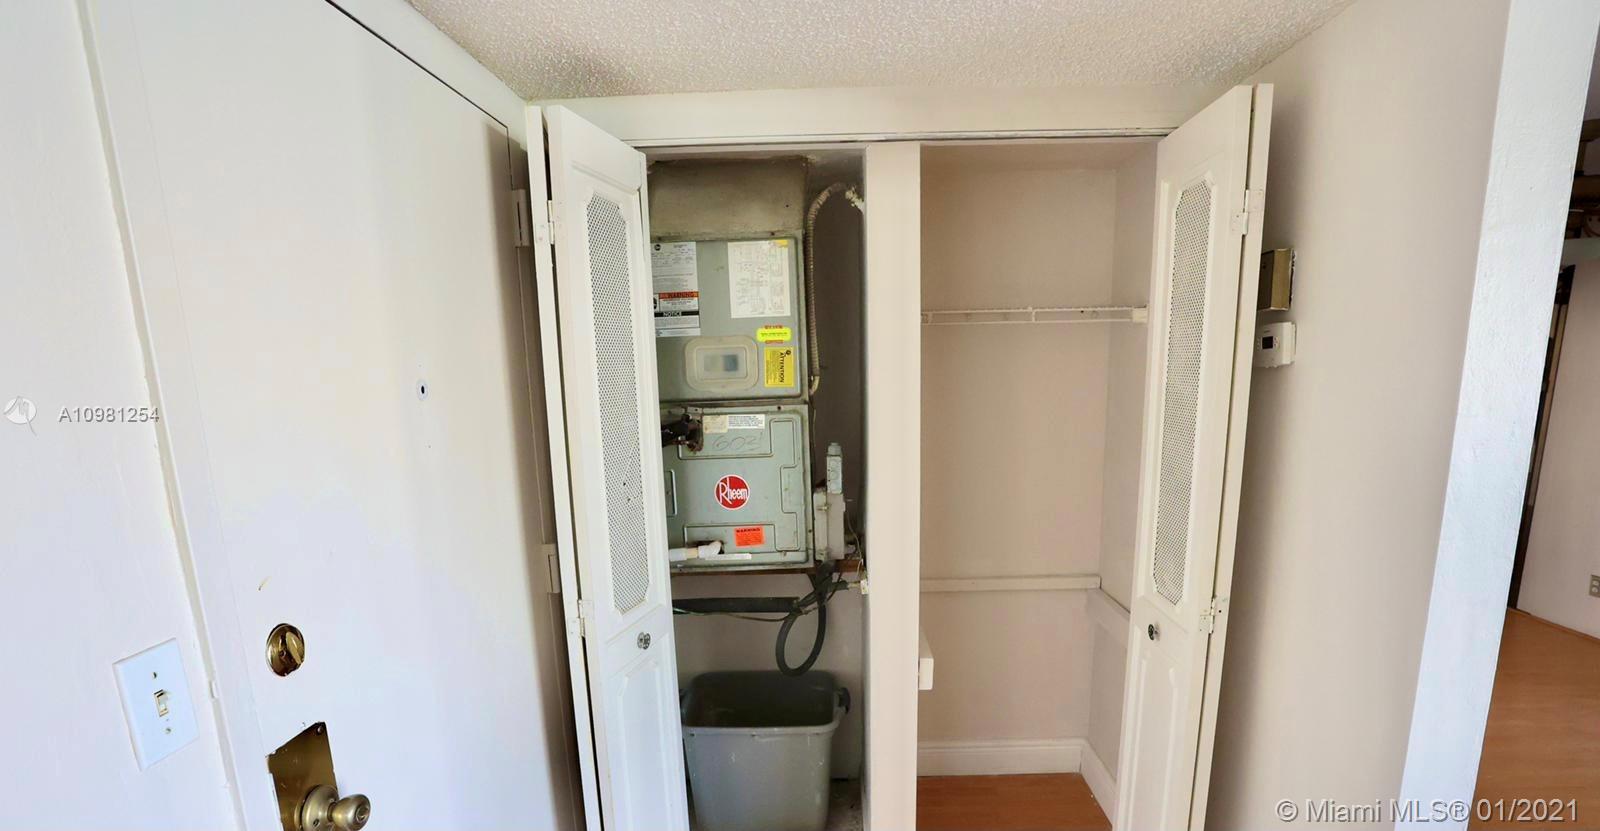 17021 N Bay Rd # 603, Sunny Isles Beach, Florida 33160, 2 Bedrooms Bedrooms, ,2 BathroomsBathrooms,Residential,For Sale,17021 N Bay Rd # 603,A10981254